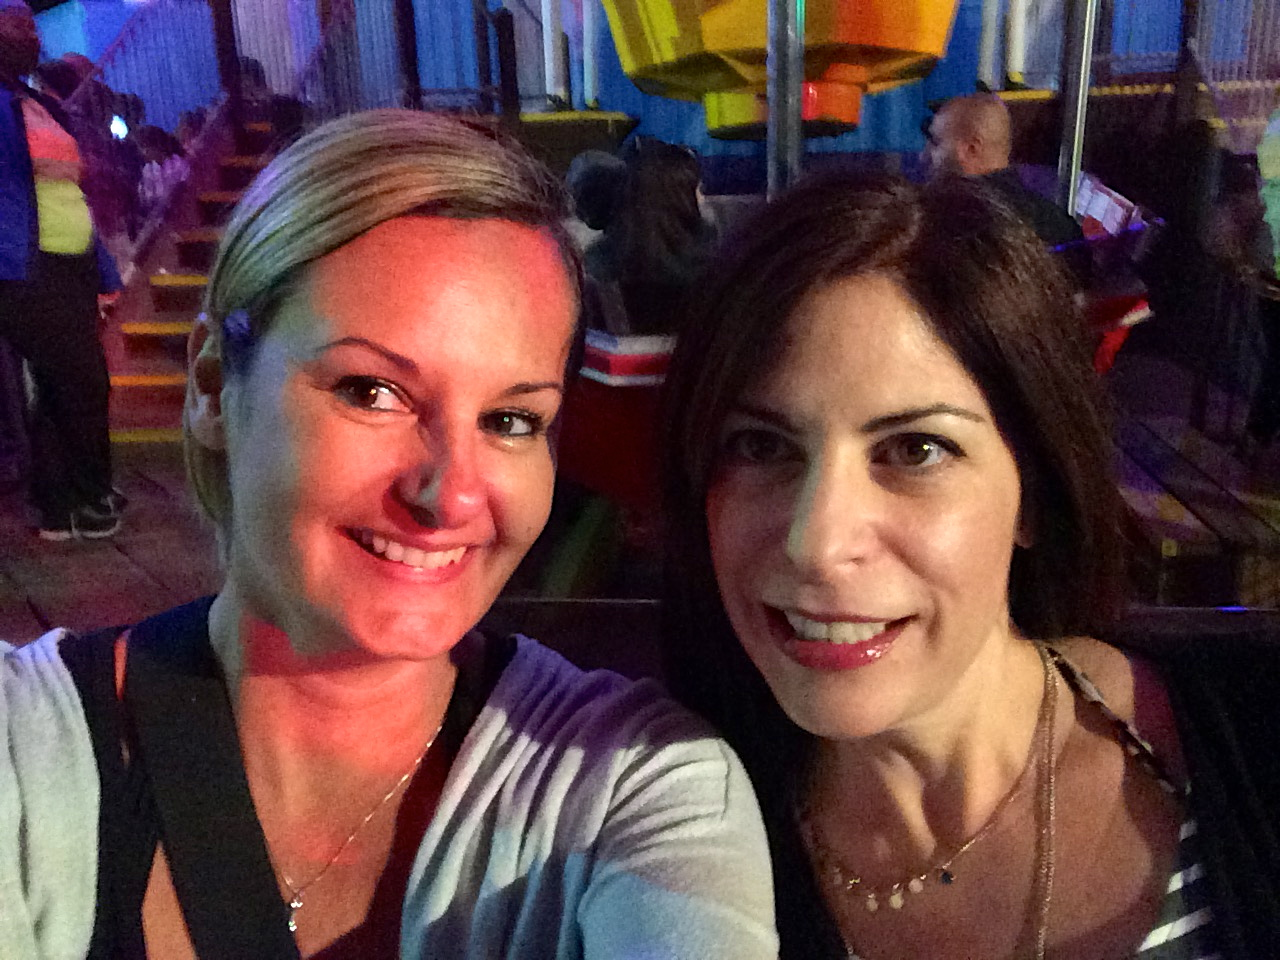 Riding the ferris wheel at the Santa Monica Pier.